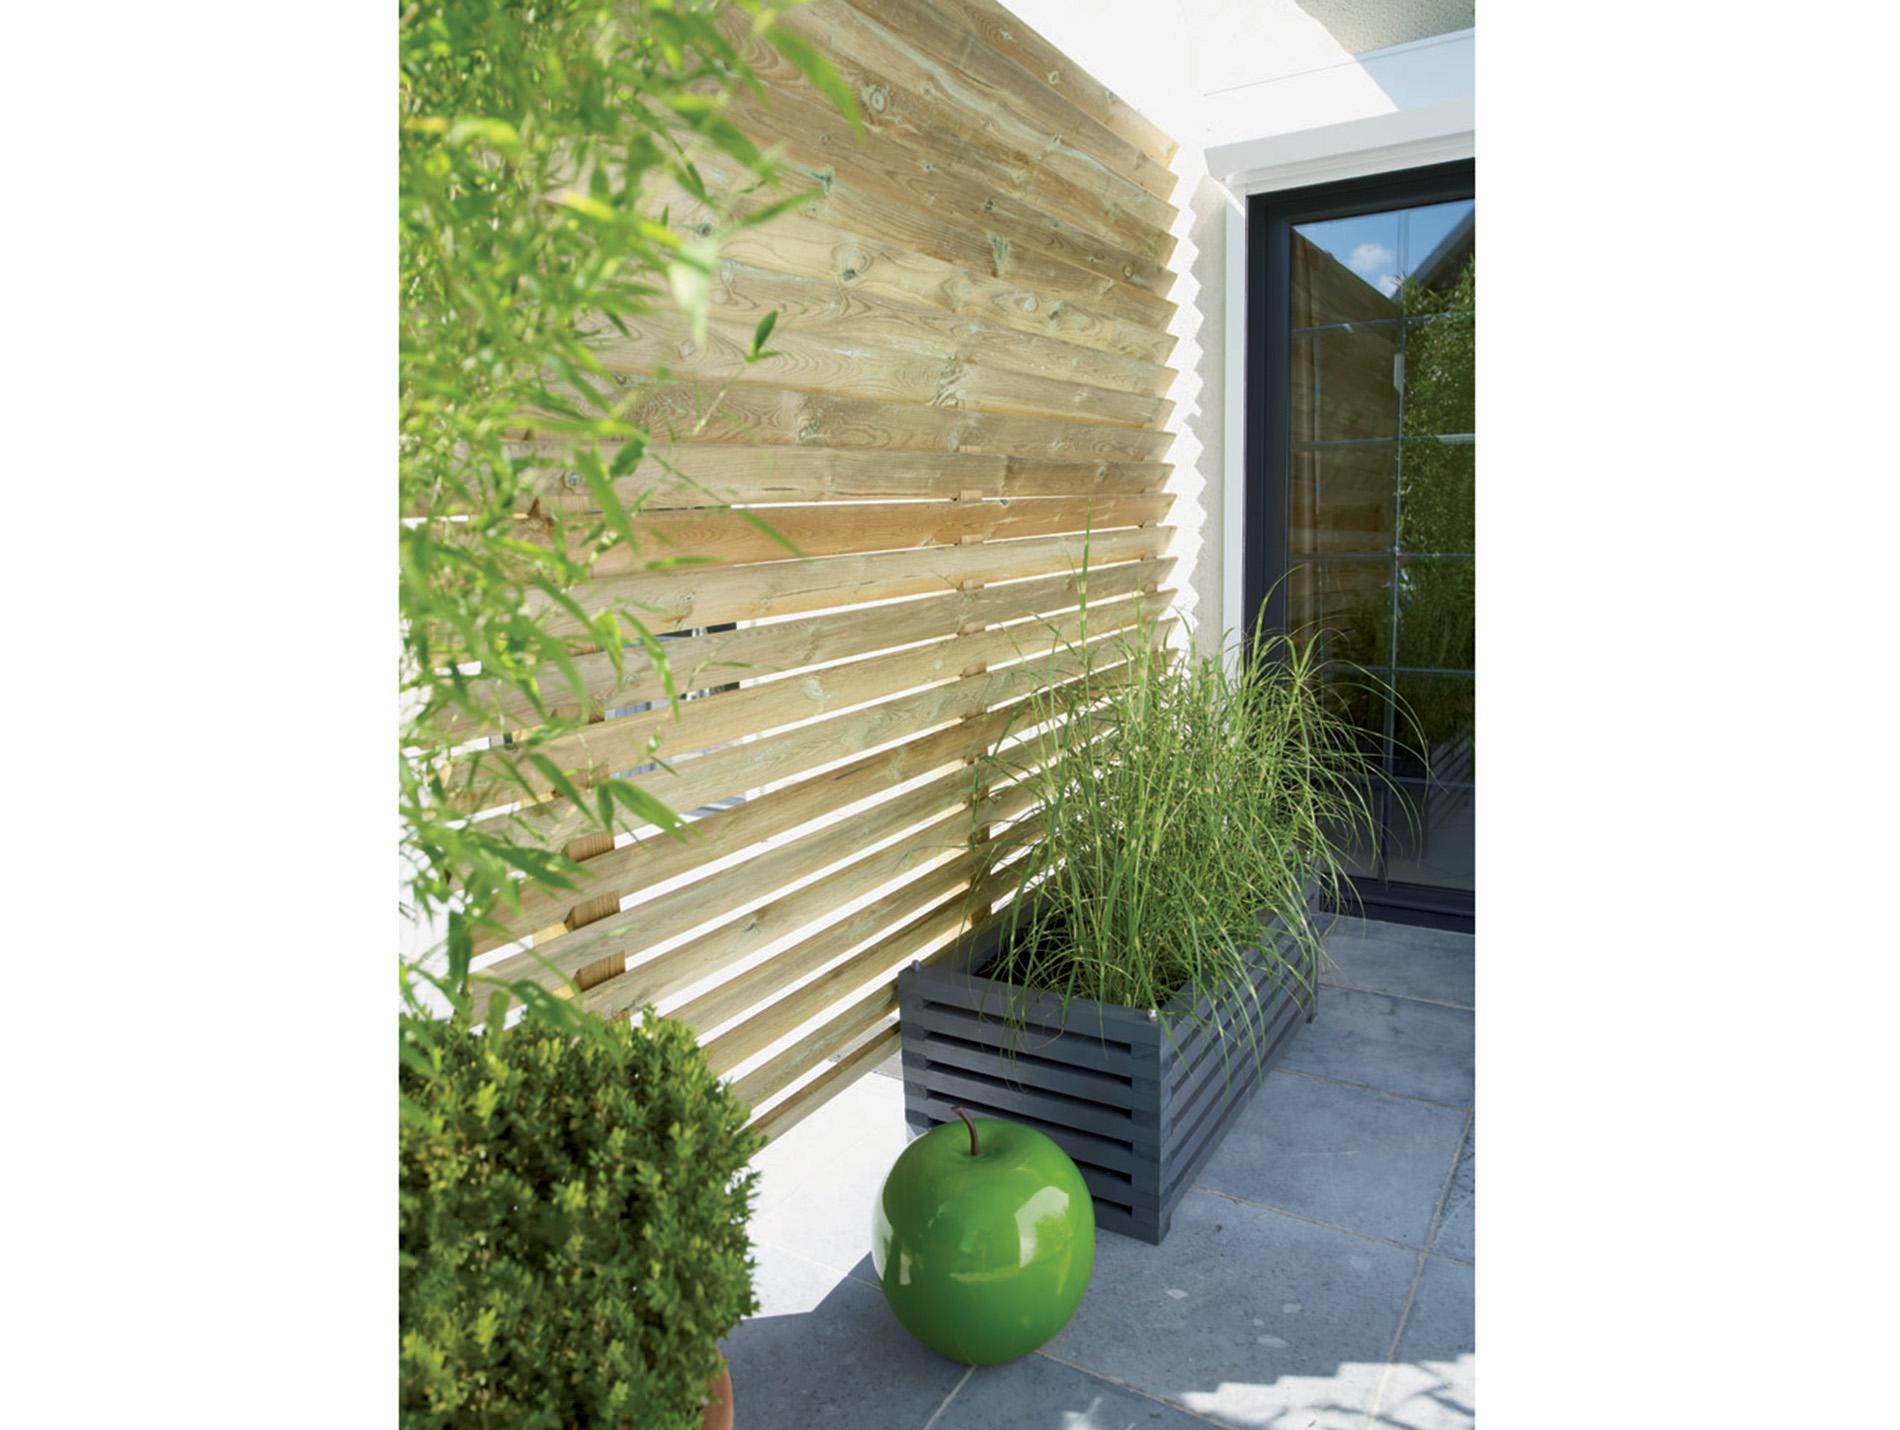 lame bois rainur e emboiter diego 2 40m. Black Bedroom Furniture Sets. Home Design Ideas